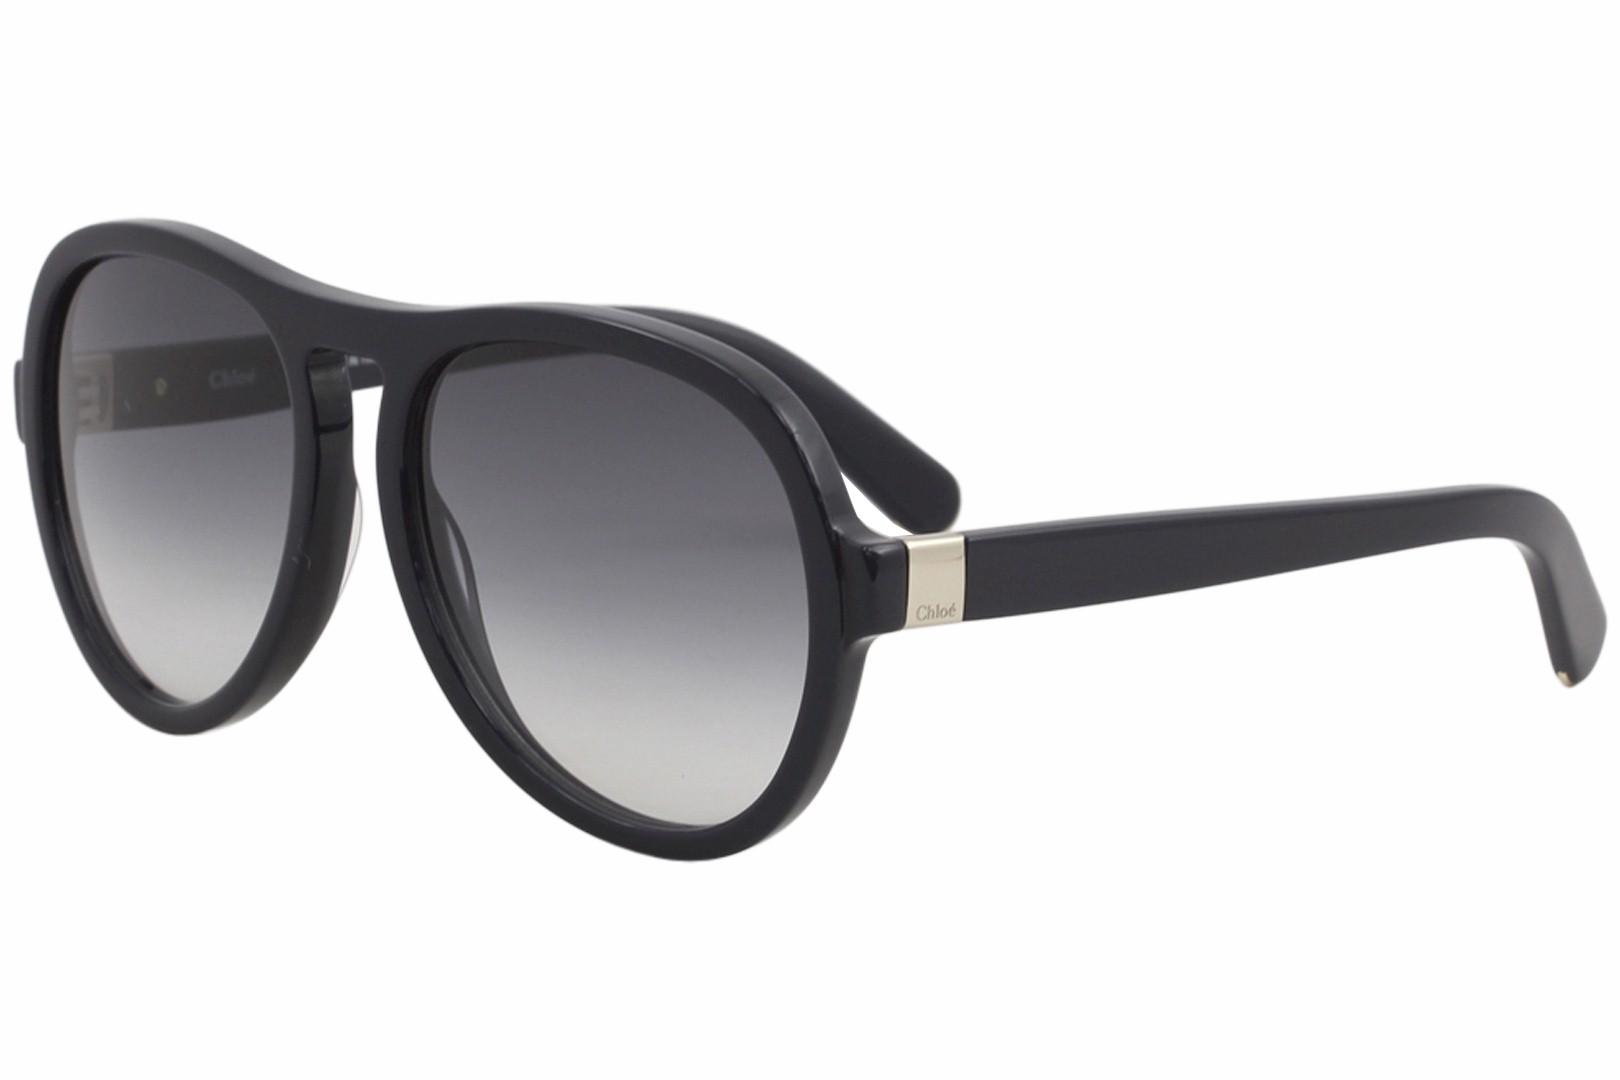 896958c2e5f Chloe Women s CE716S CE 716 S Blue 424 Fashion Pilot Sunglasses 59mm ...